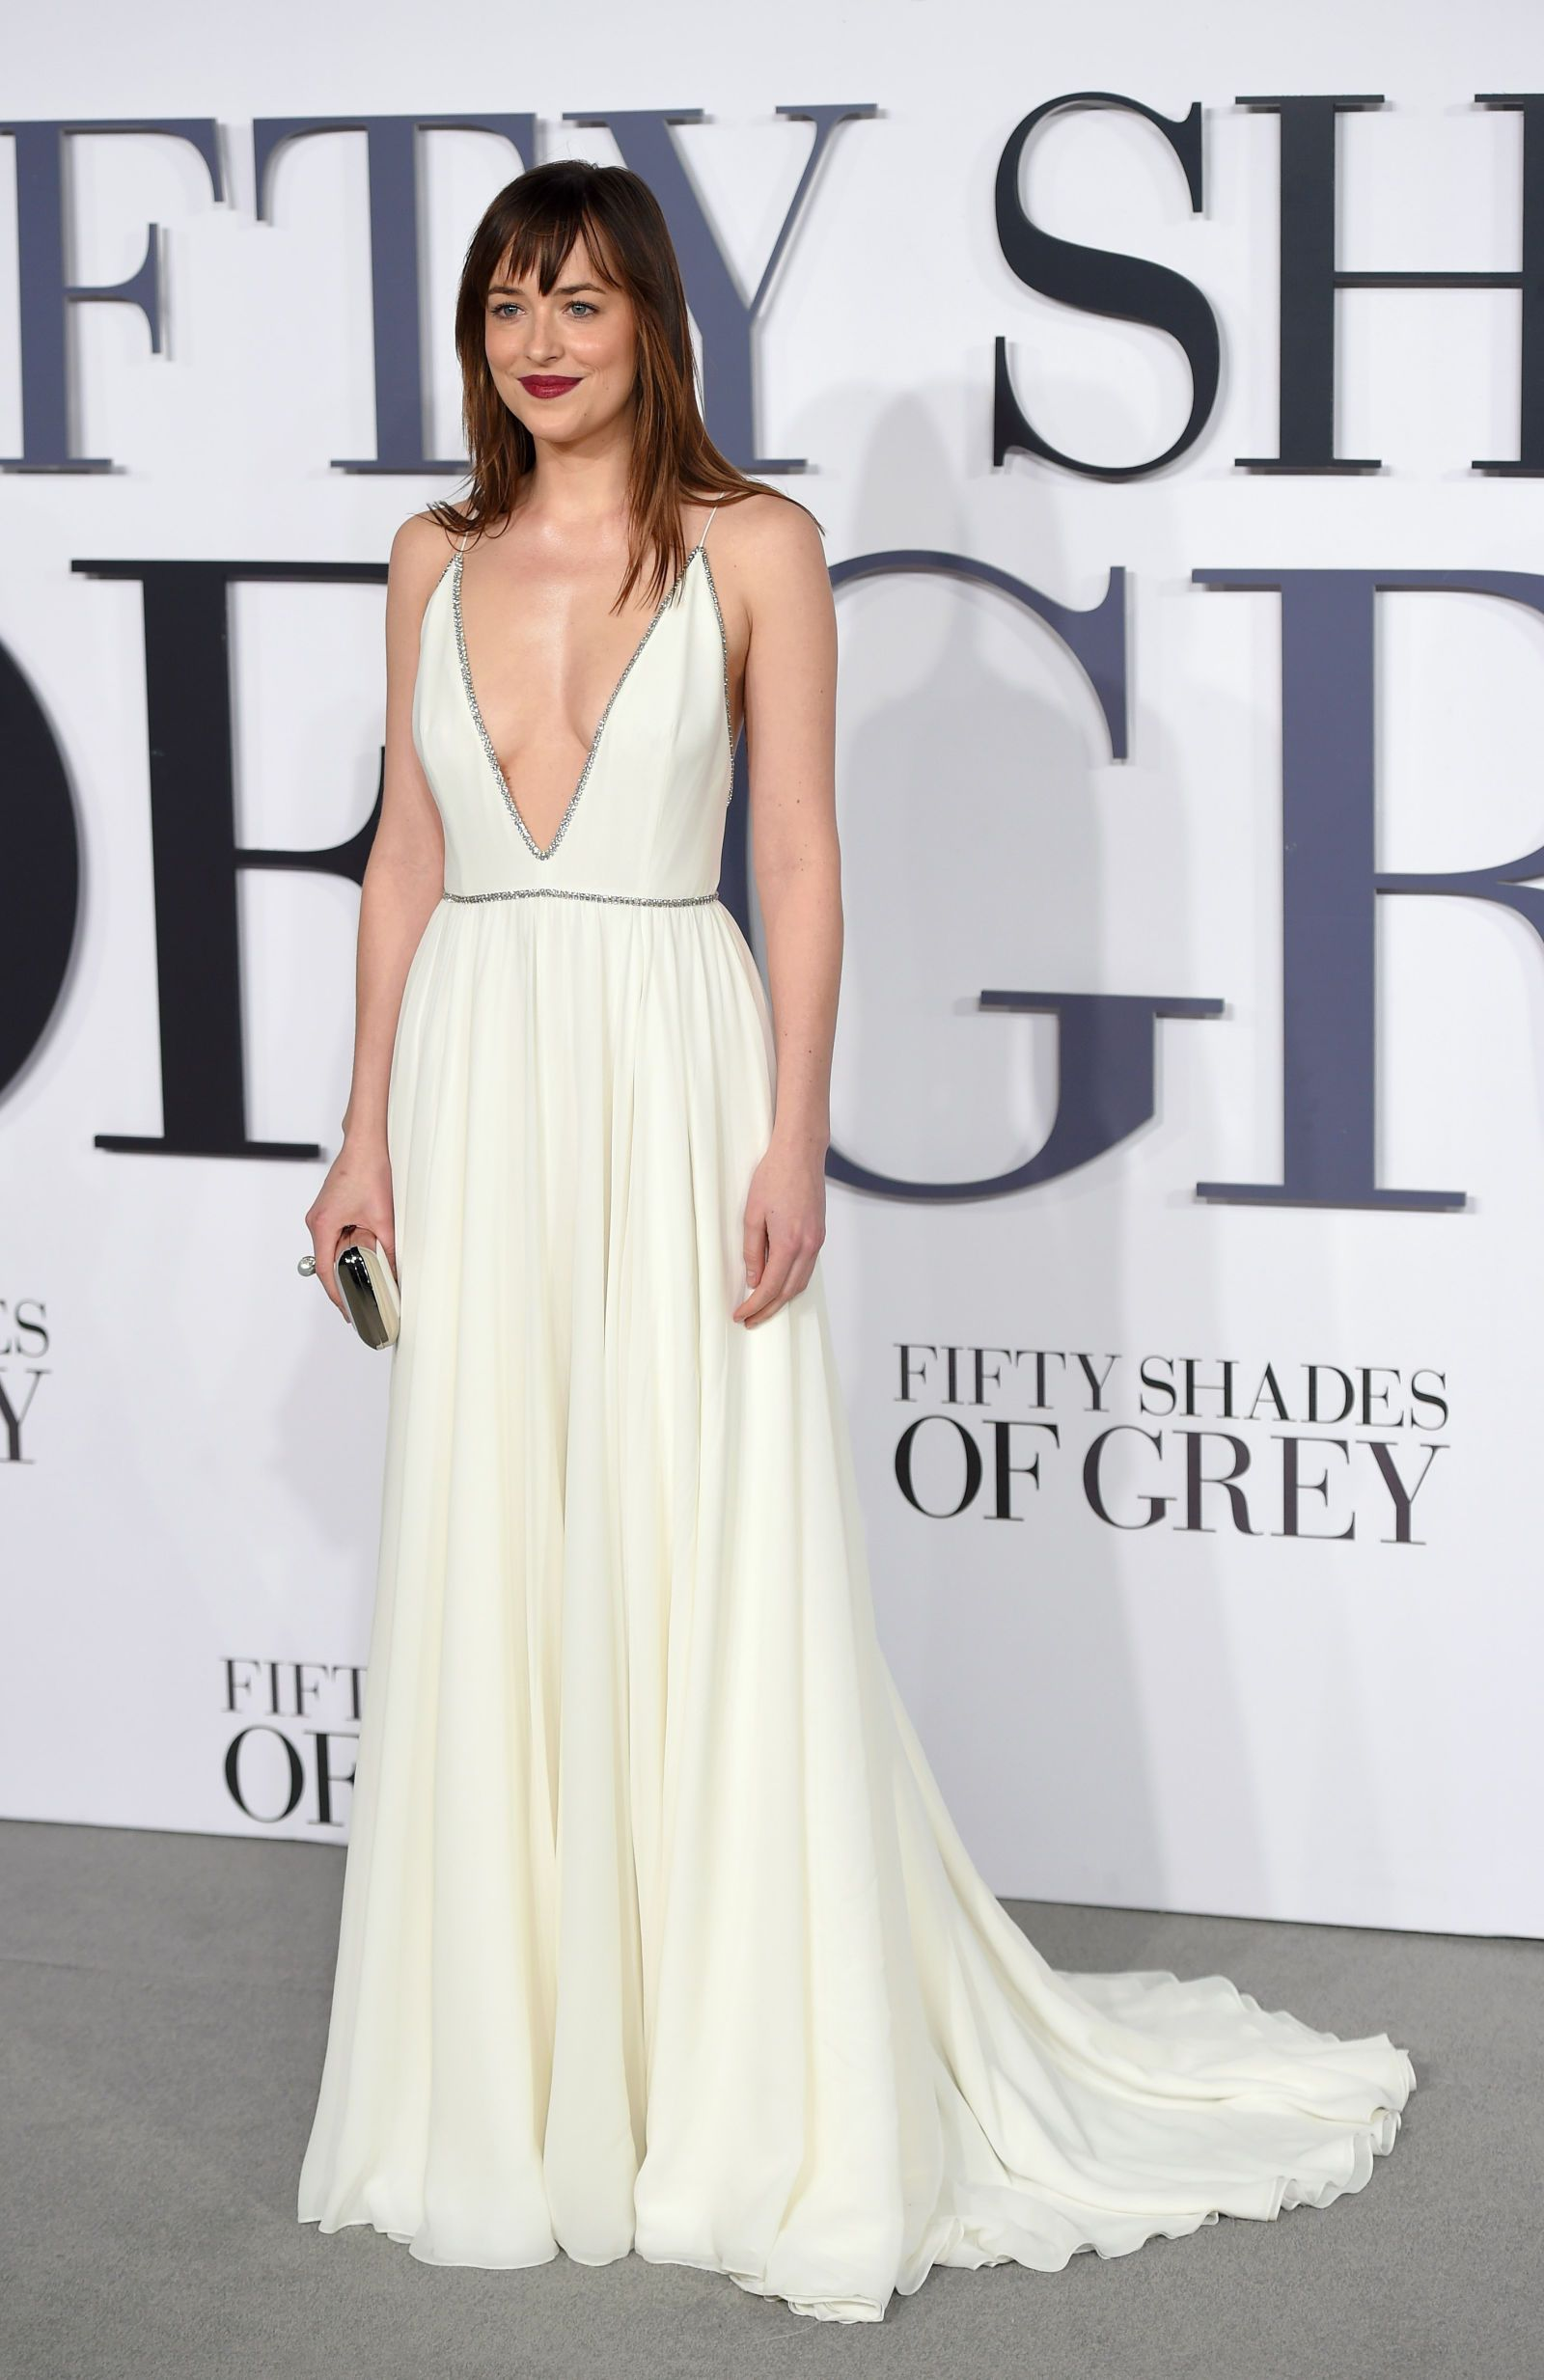 Dakota Johnson Goes for a Romantic, Bridal-esque Dress at Fifty ...